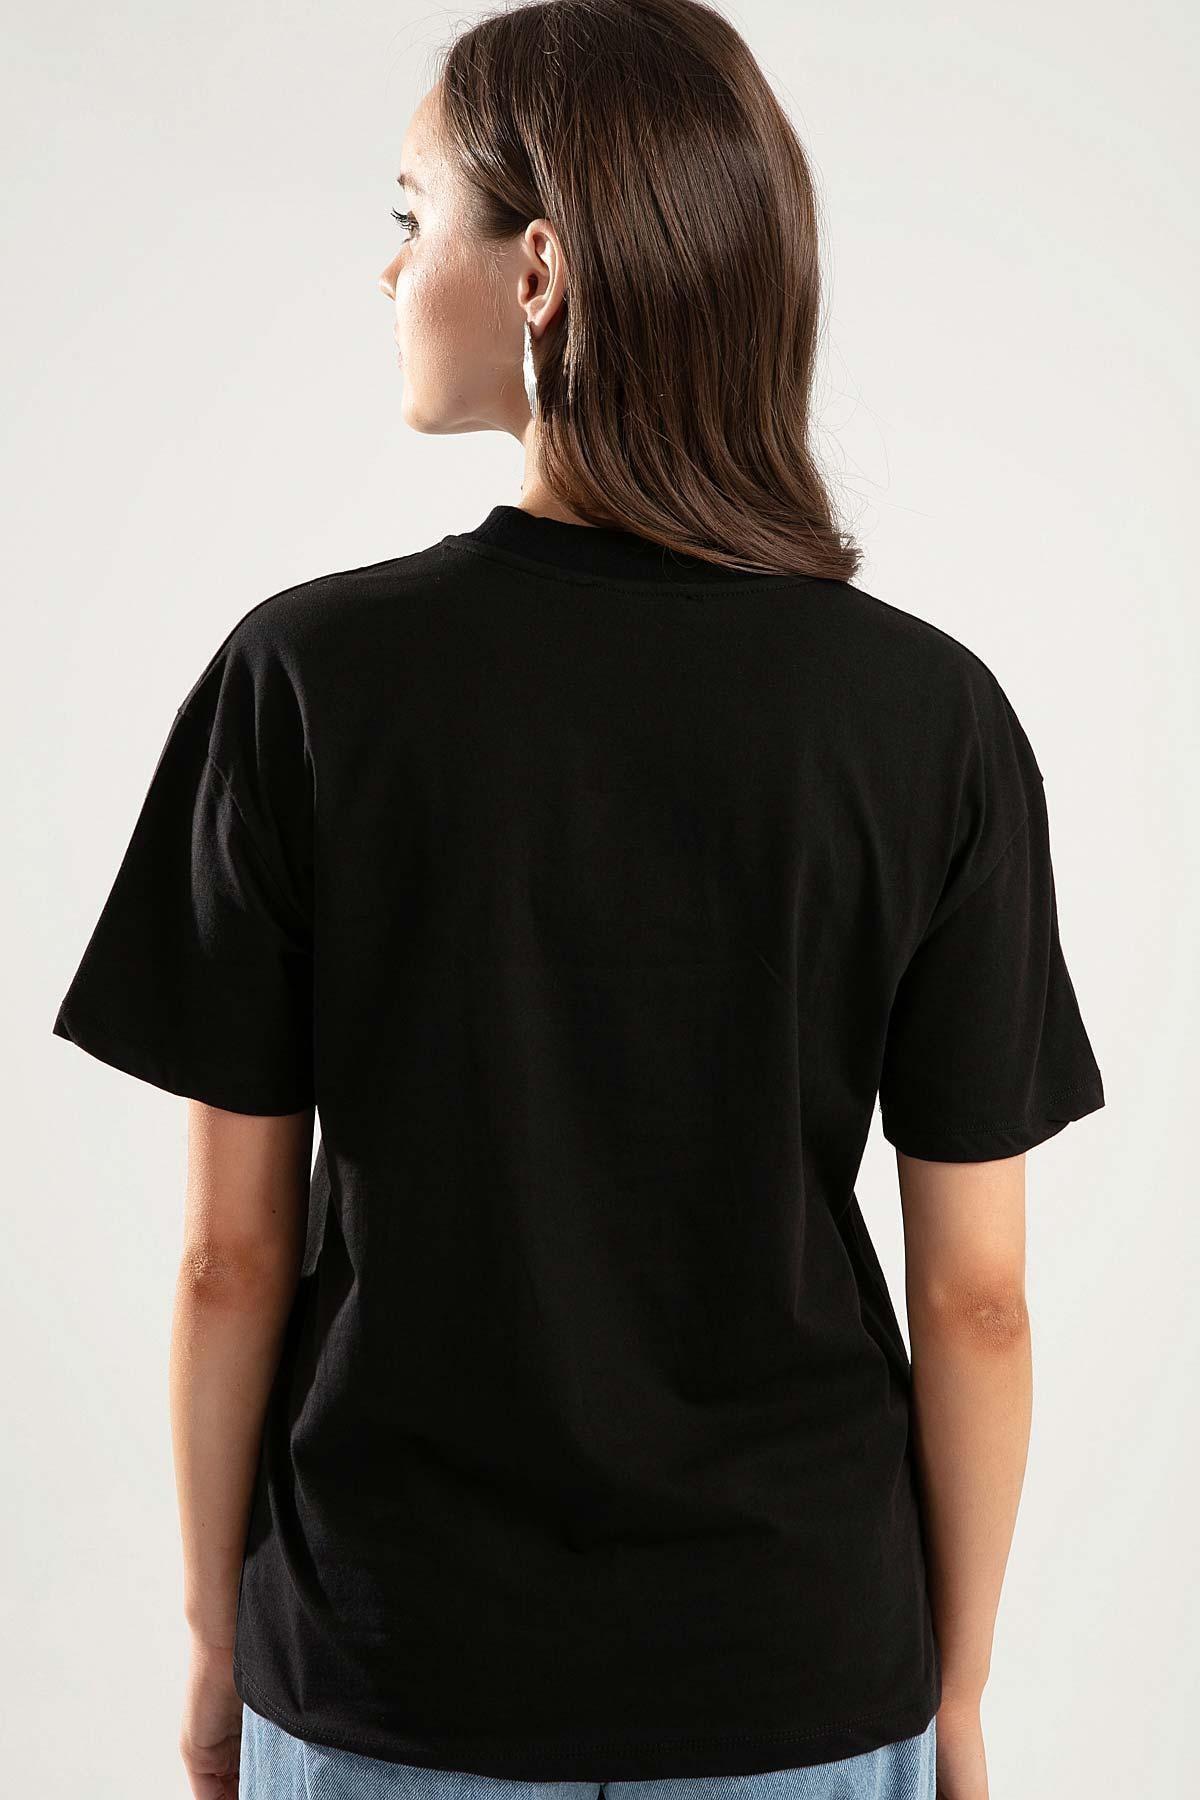 Pattaya Kadın Siyah Dik Yaka Basic Tişört PTTY20S-701 3